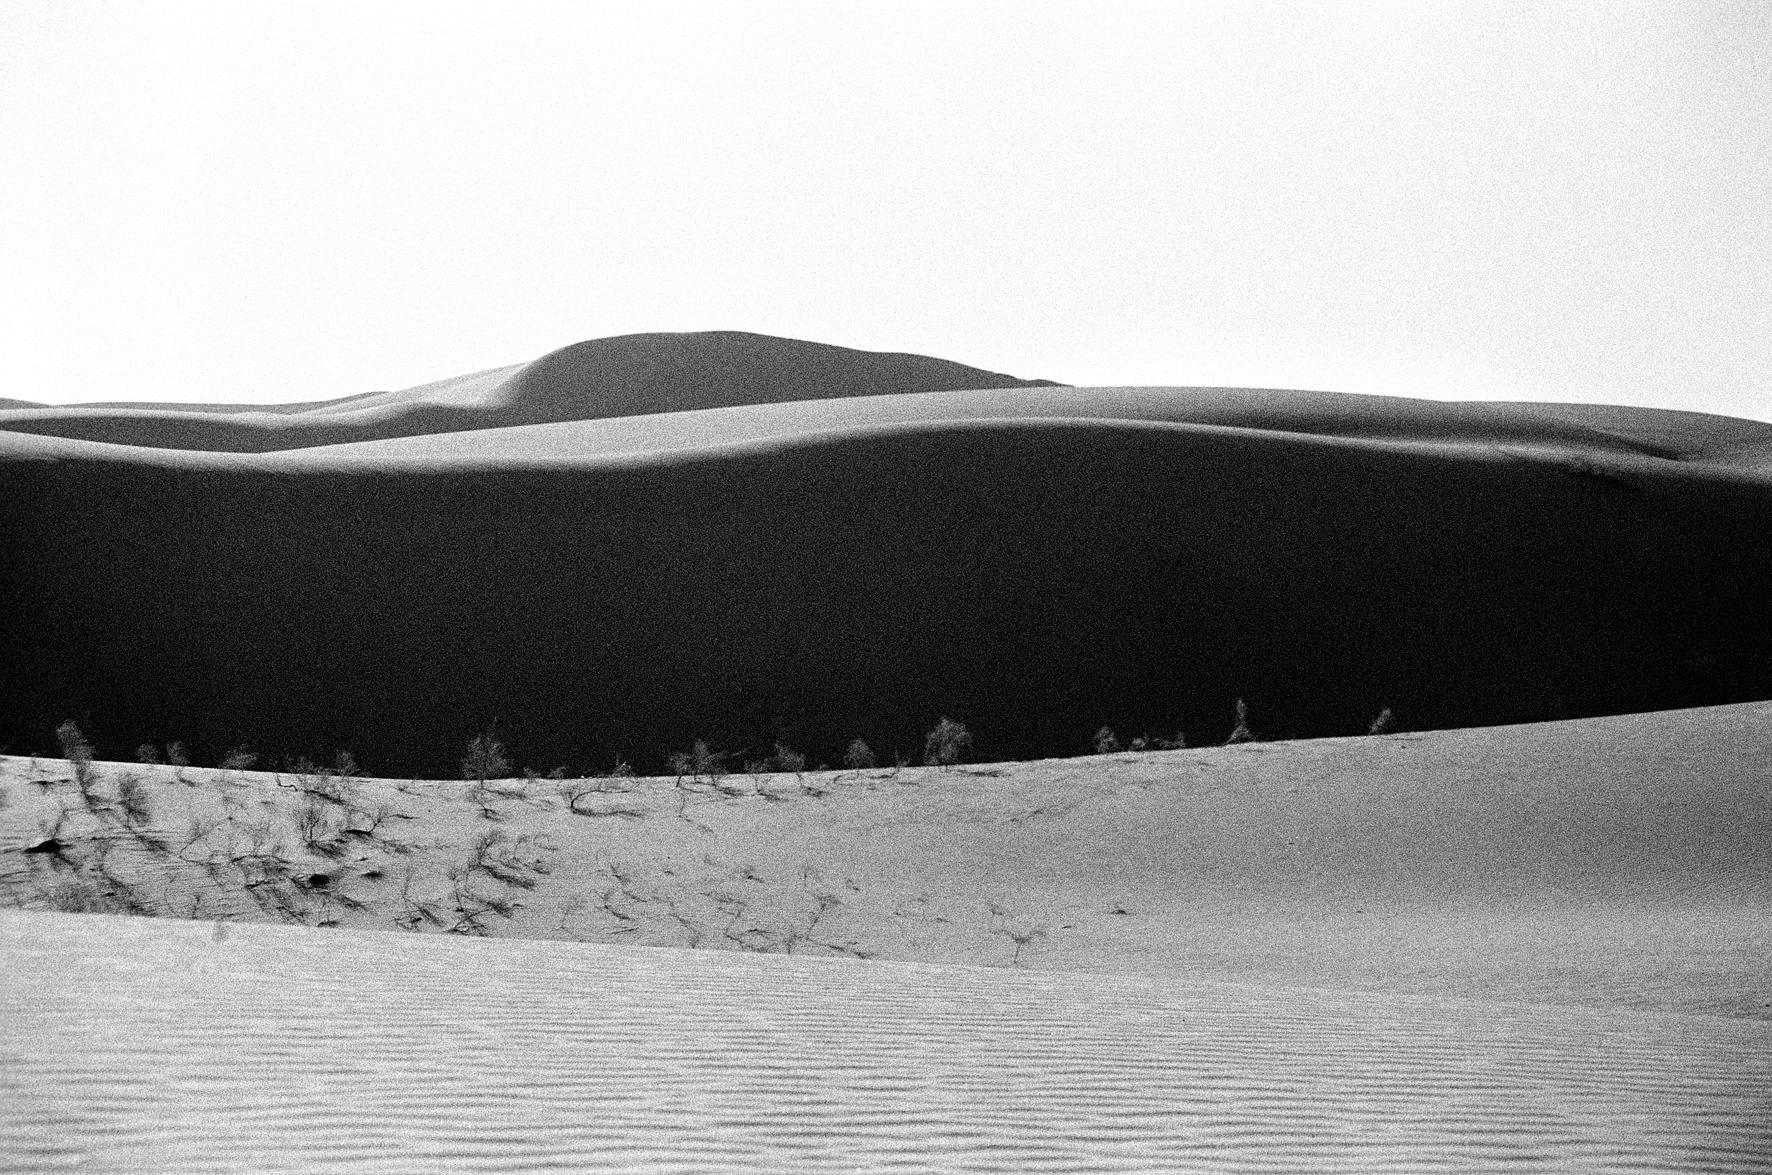 maranjab desert9.jpg